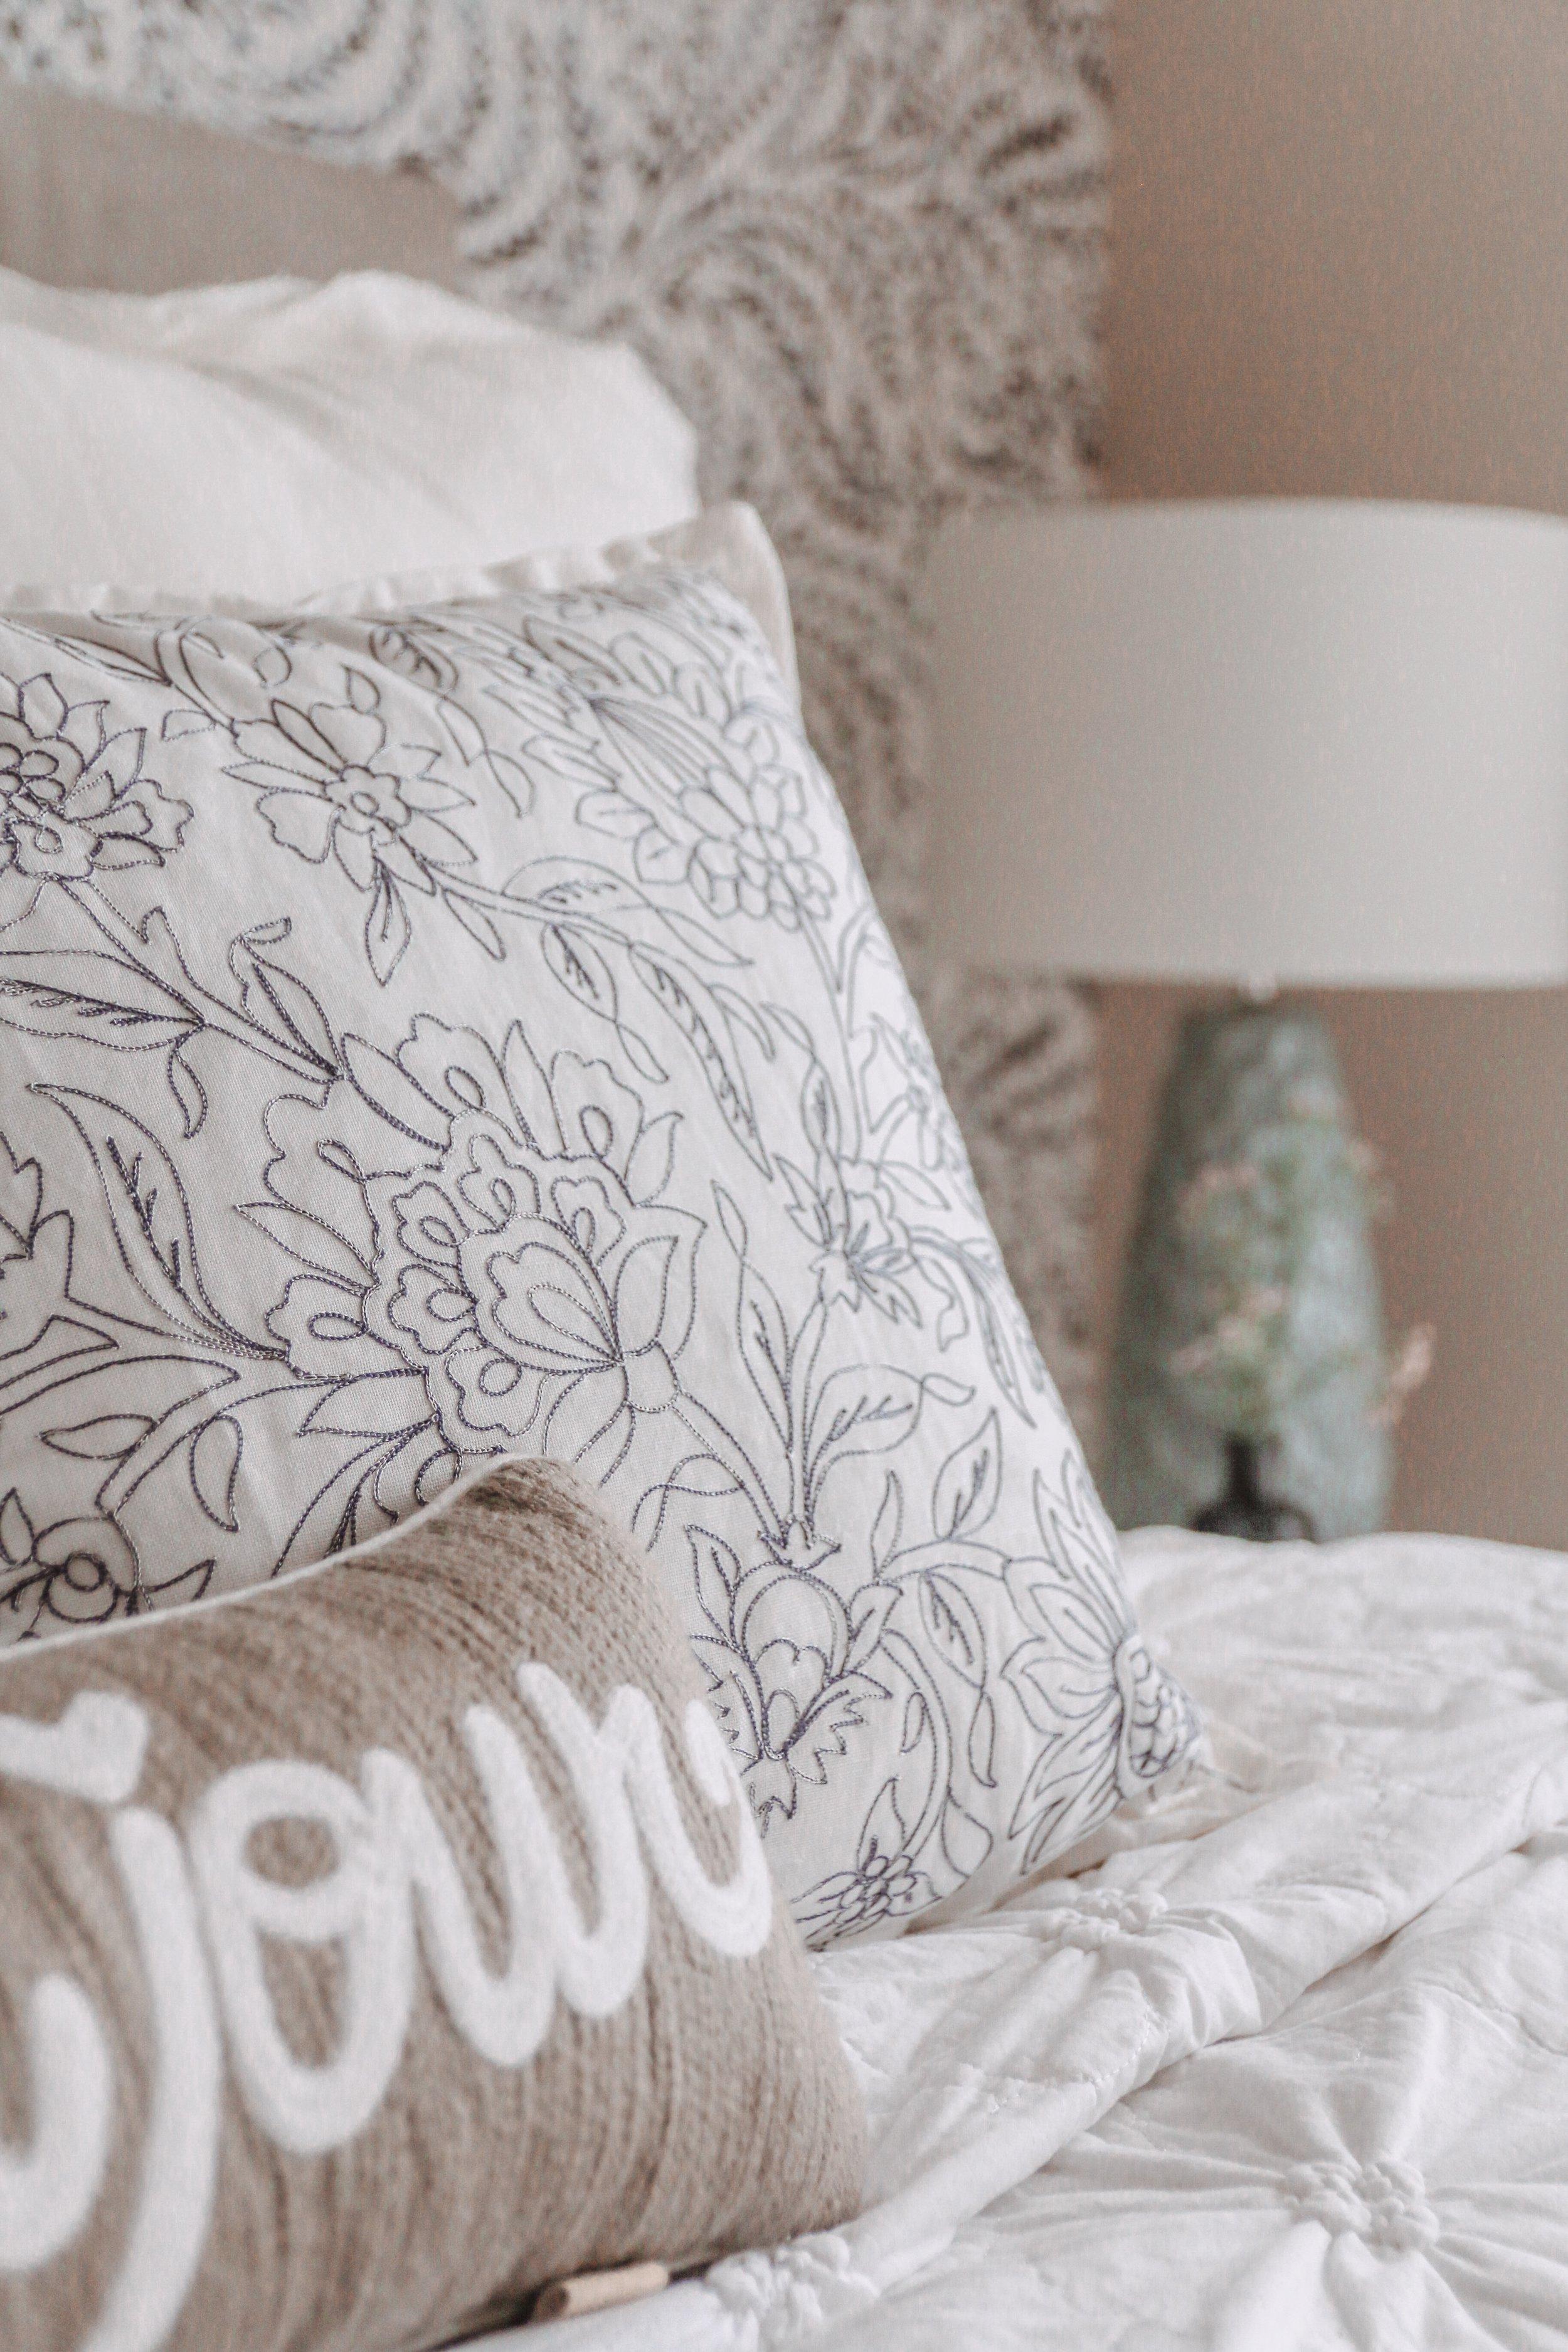 guest room re-design